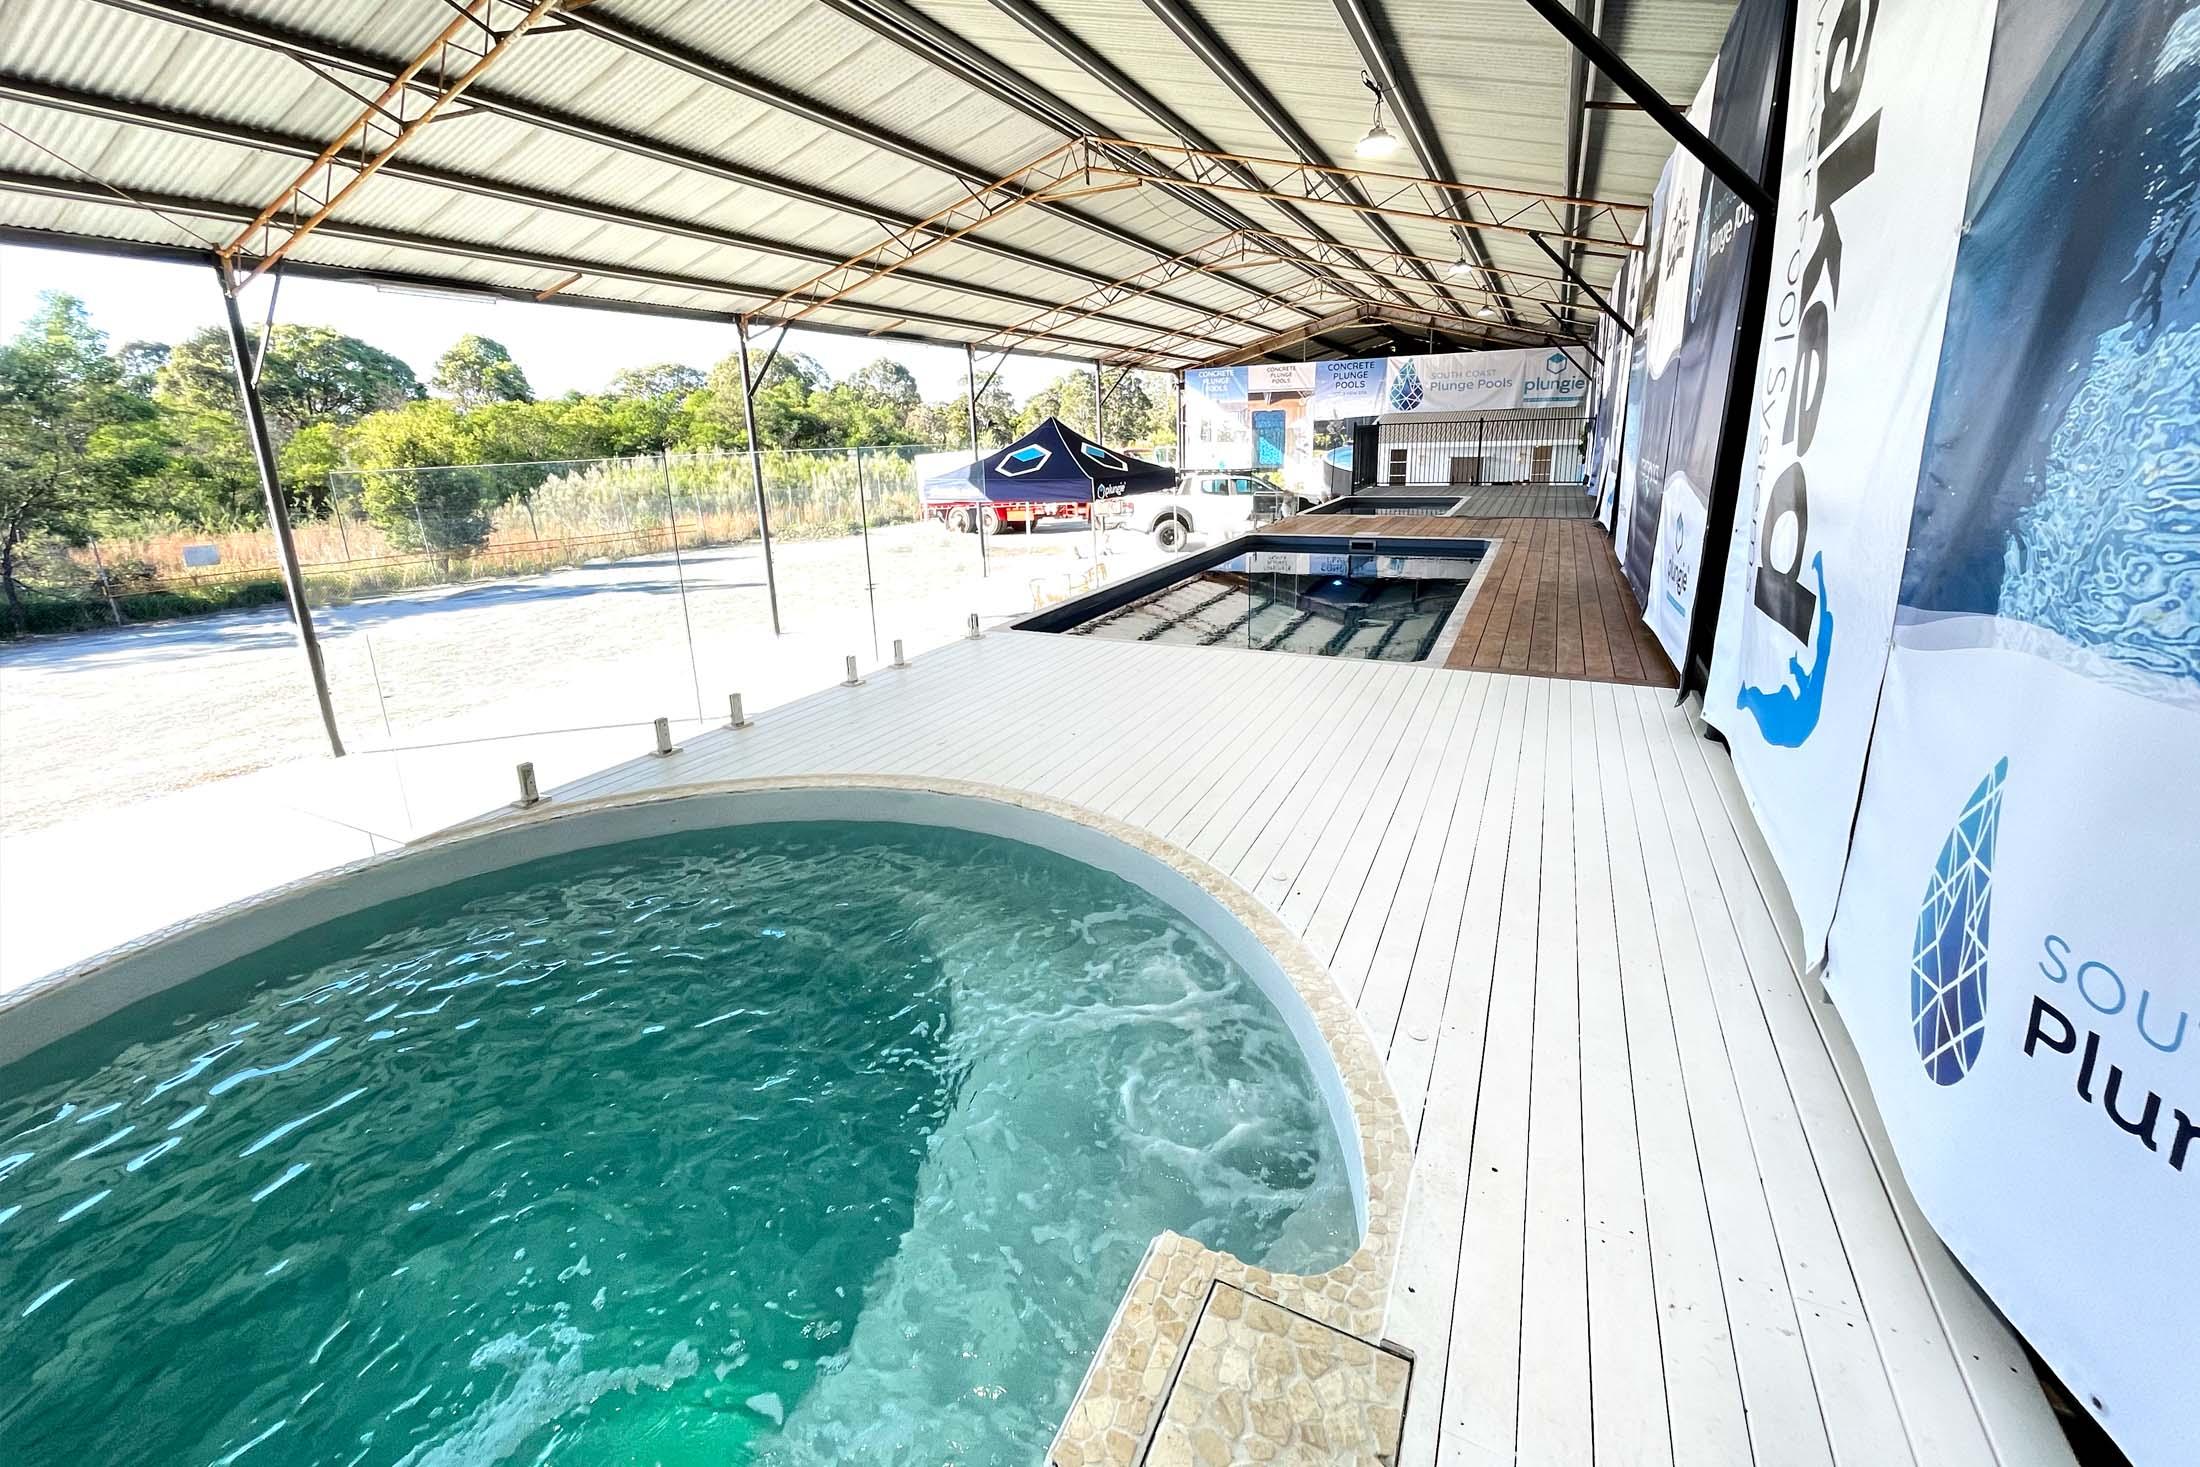 South Coast Plunge Pools Plungie display